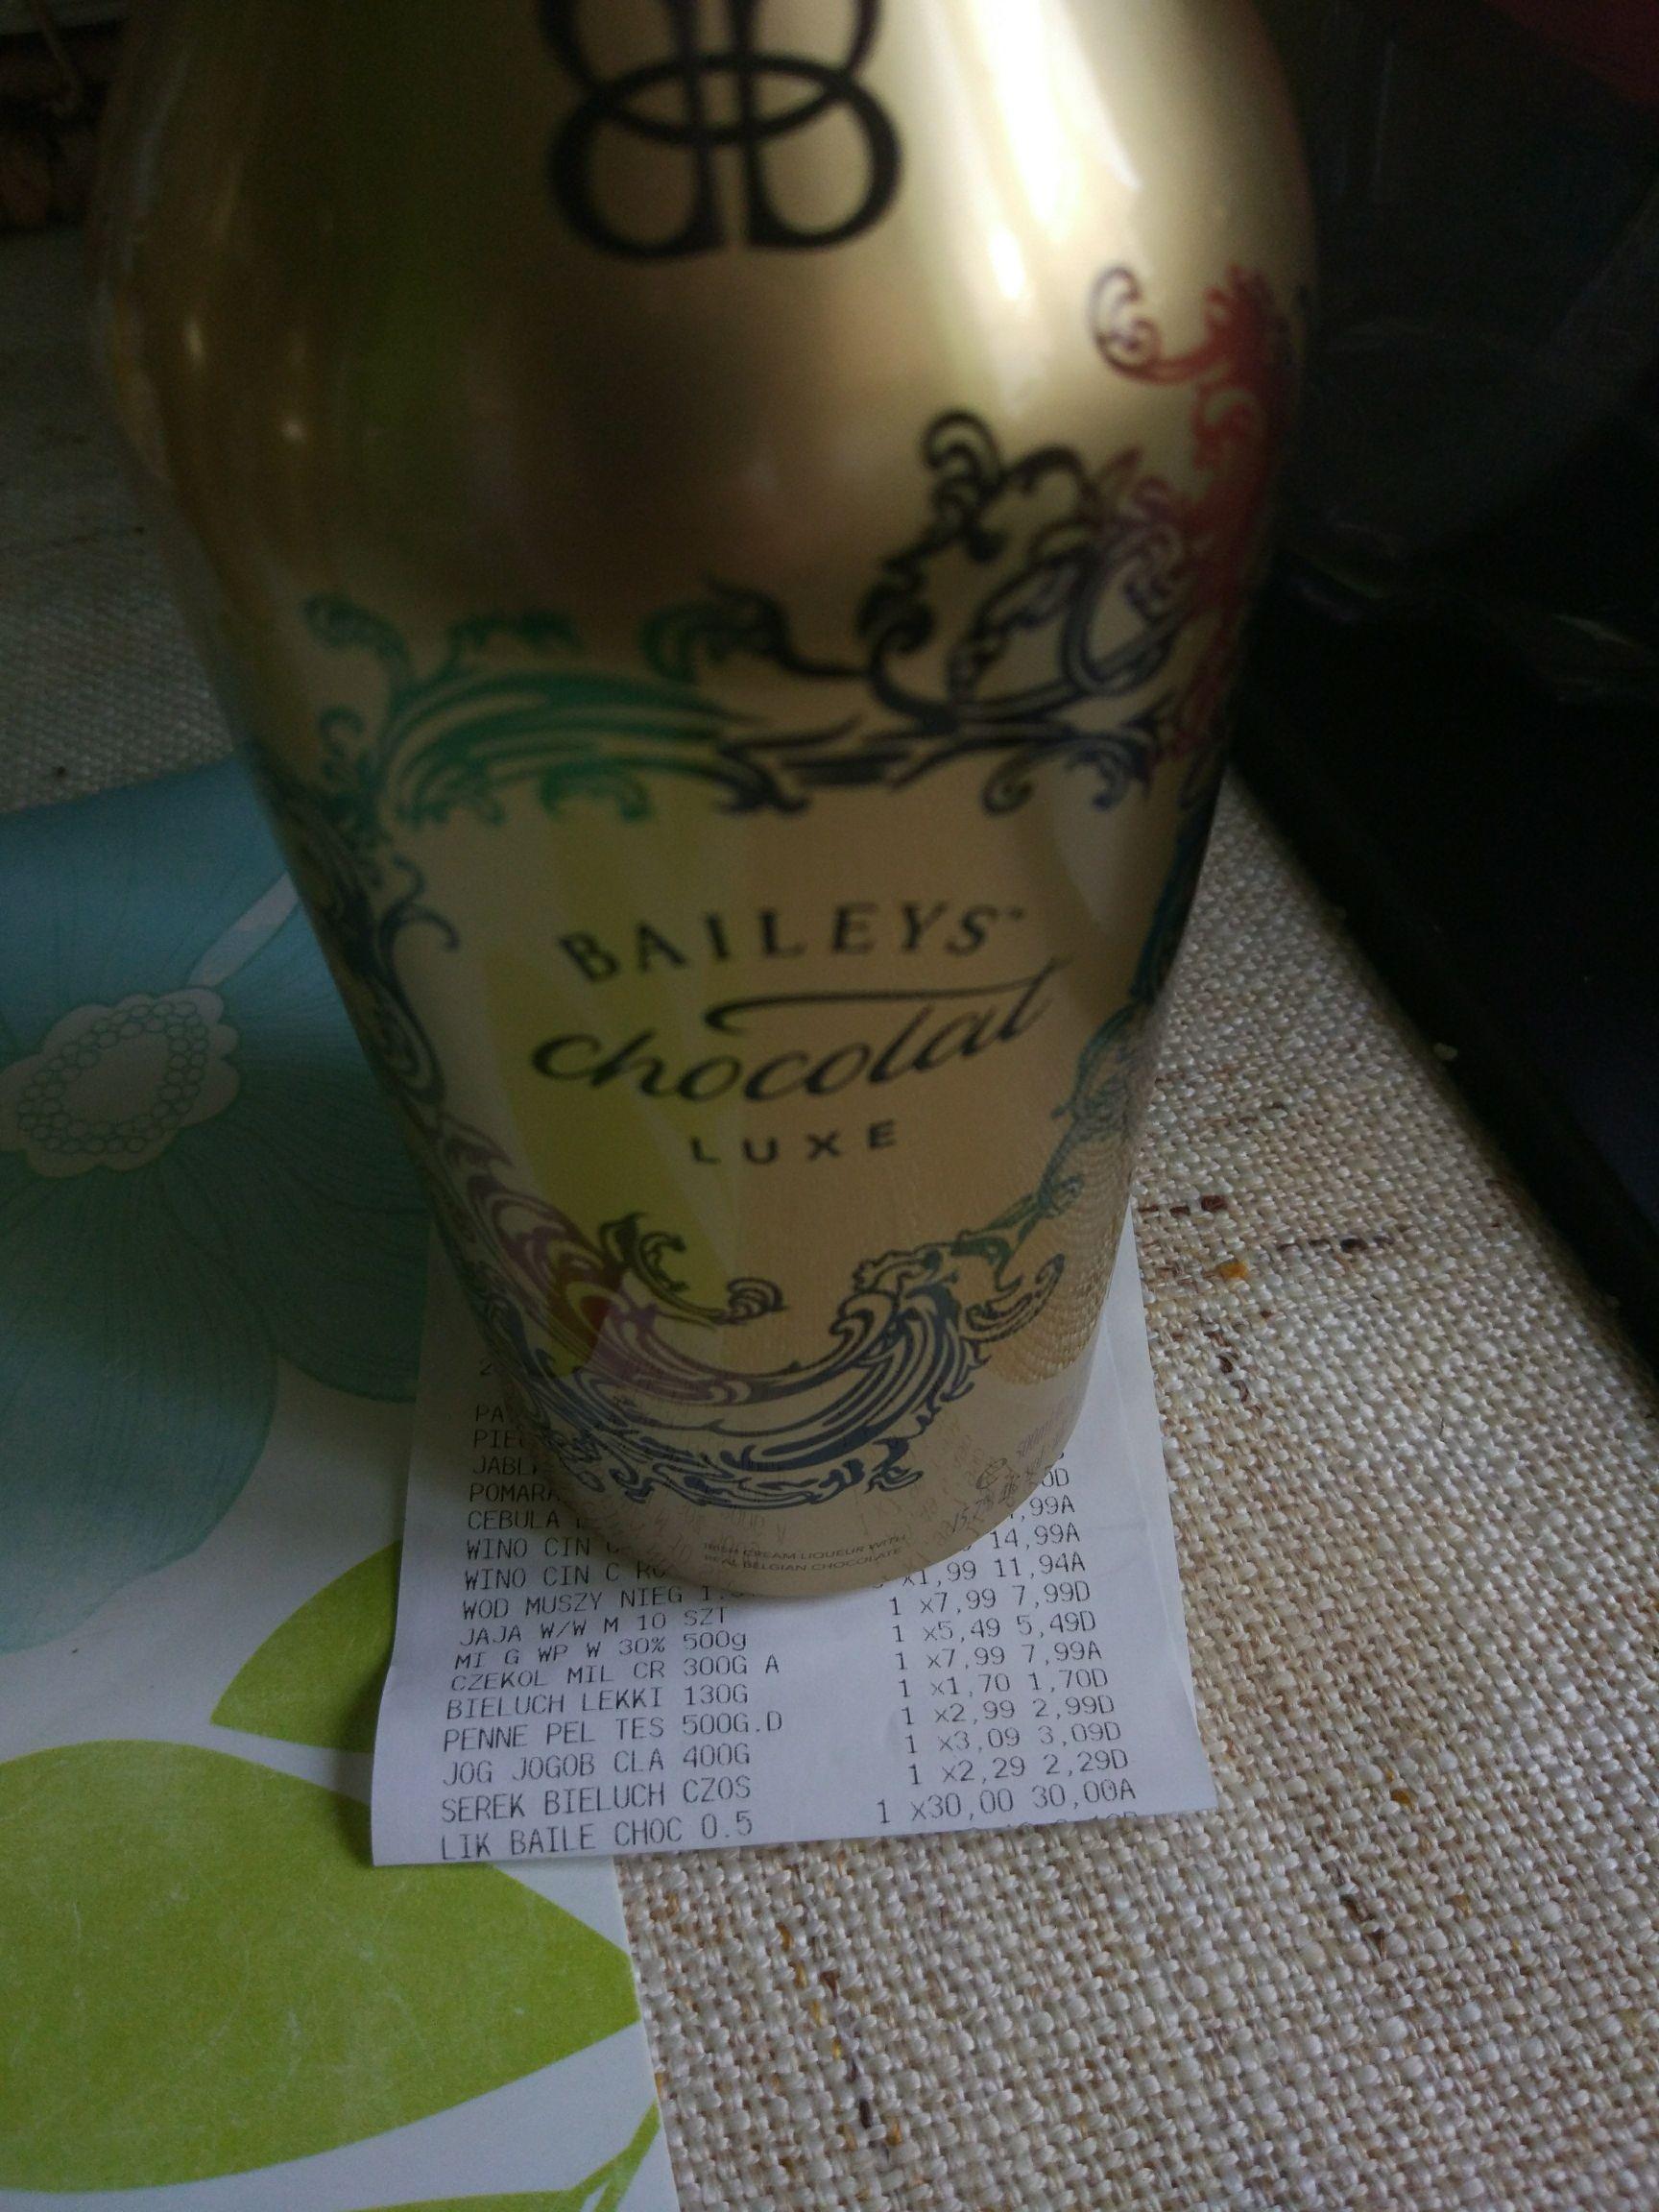 Baileys chocolat luxe 30 zł (-50%) Tesco